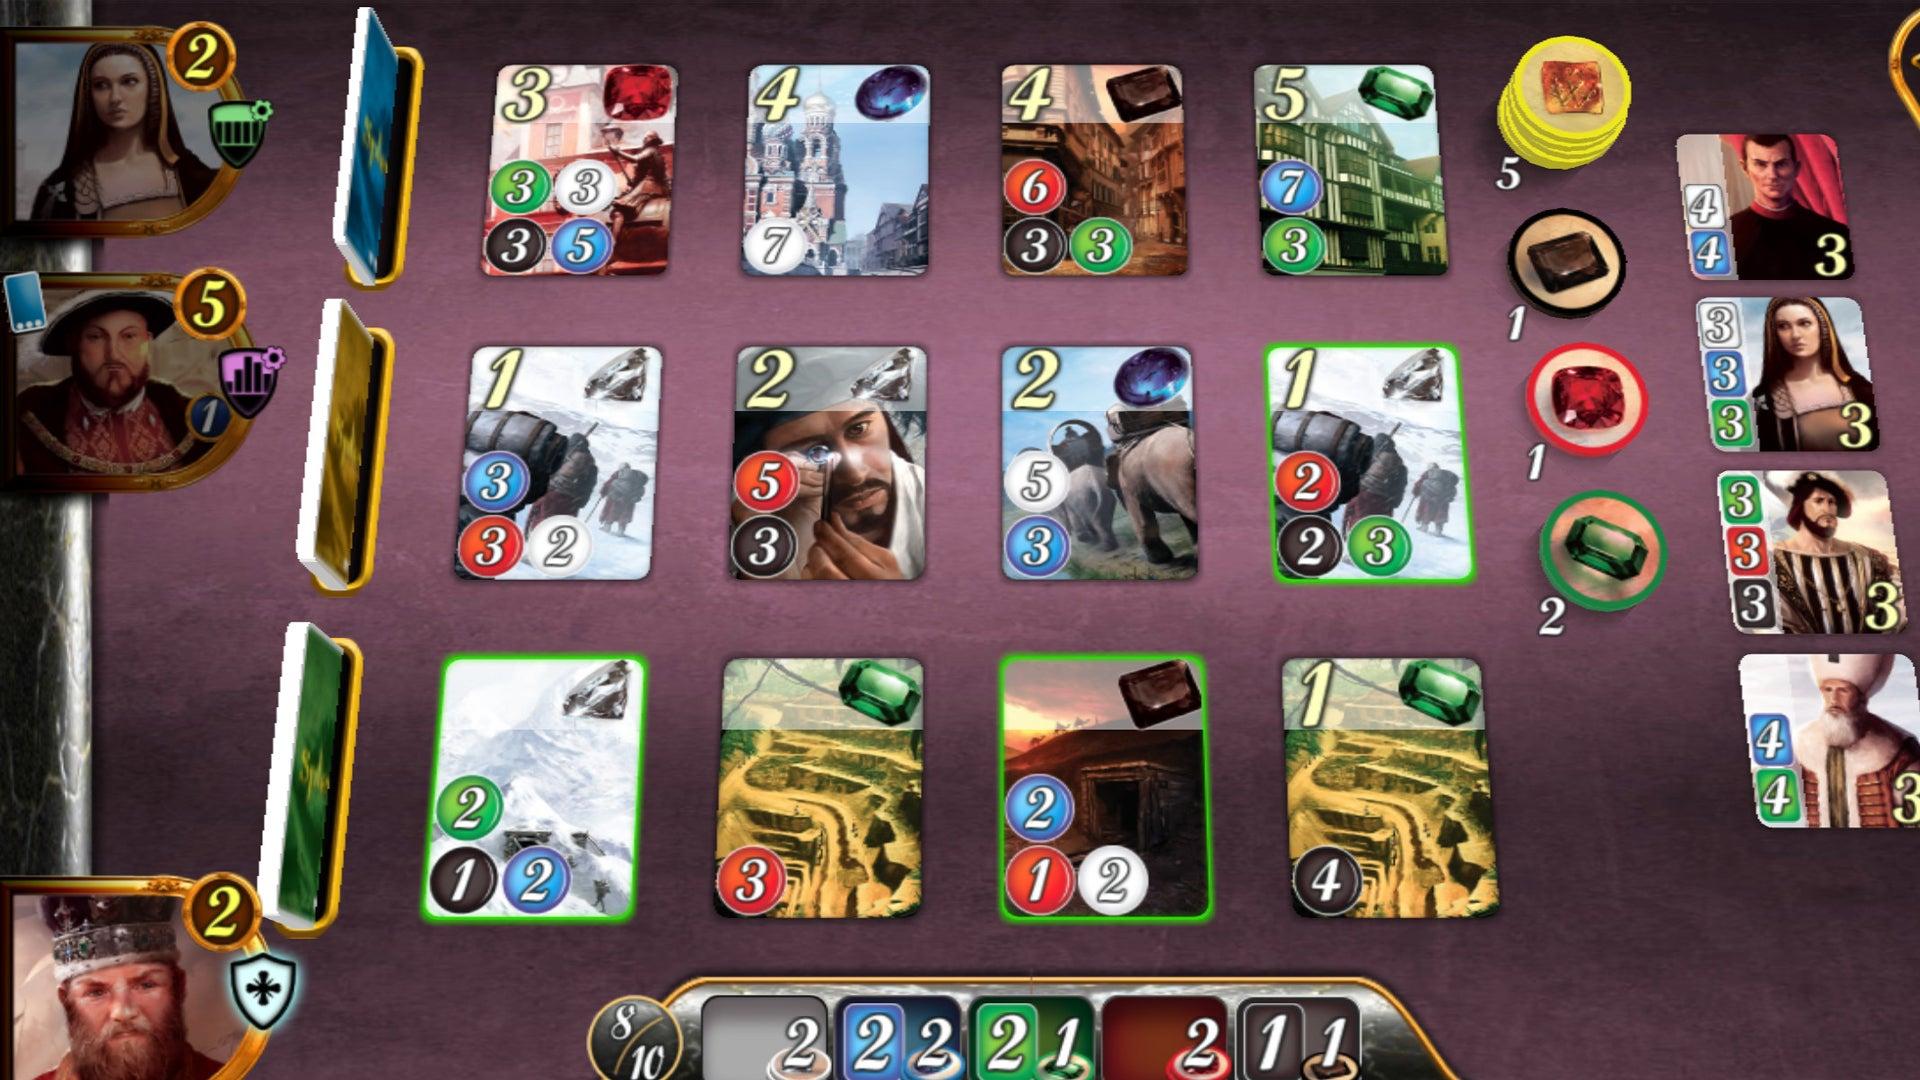 Splendor digital board game screenshot